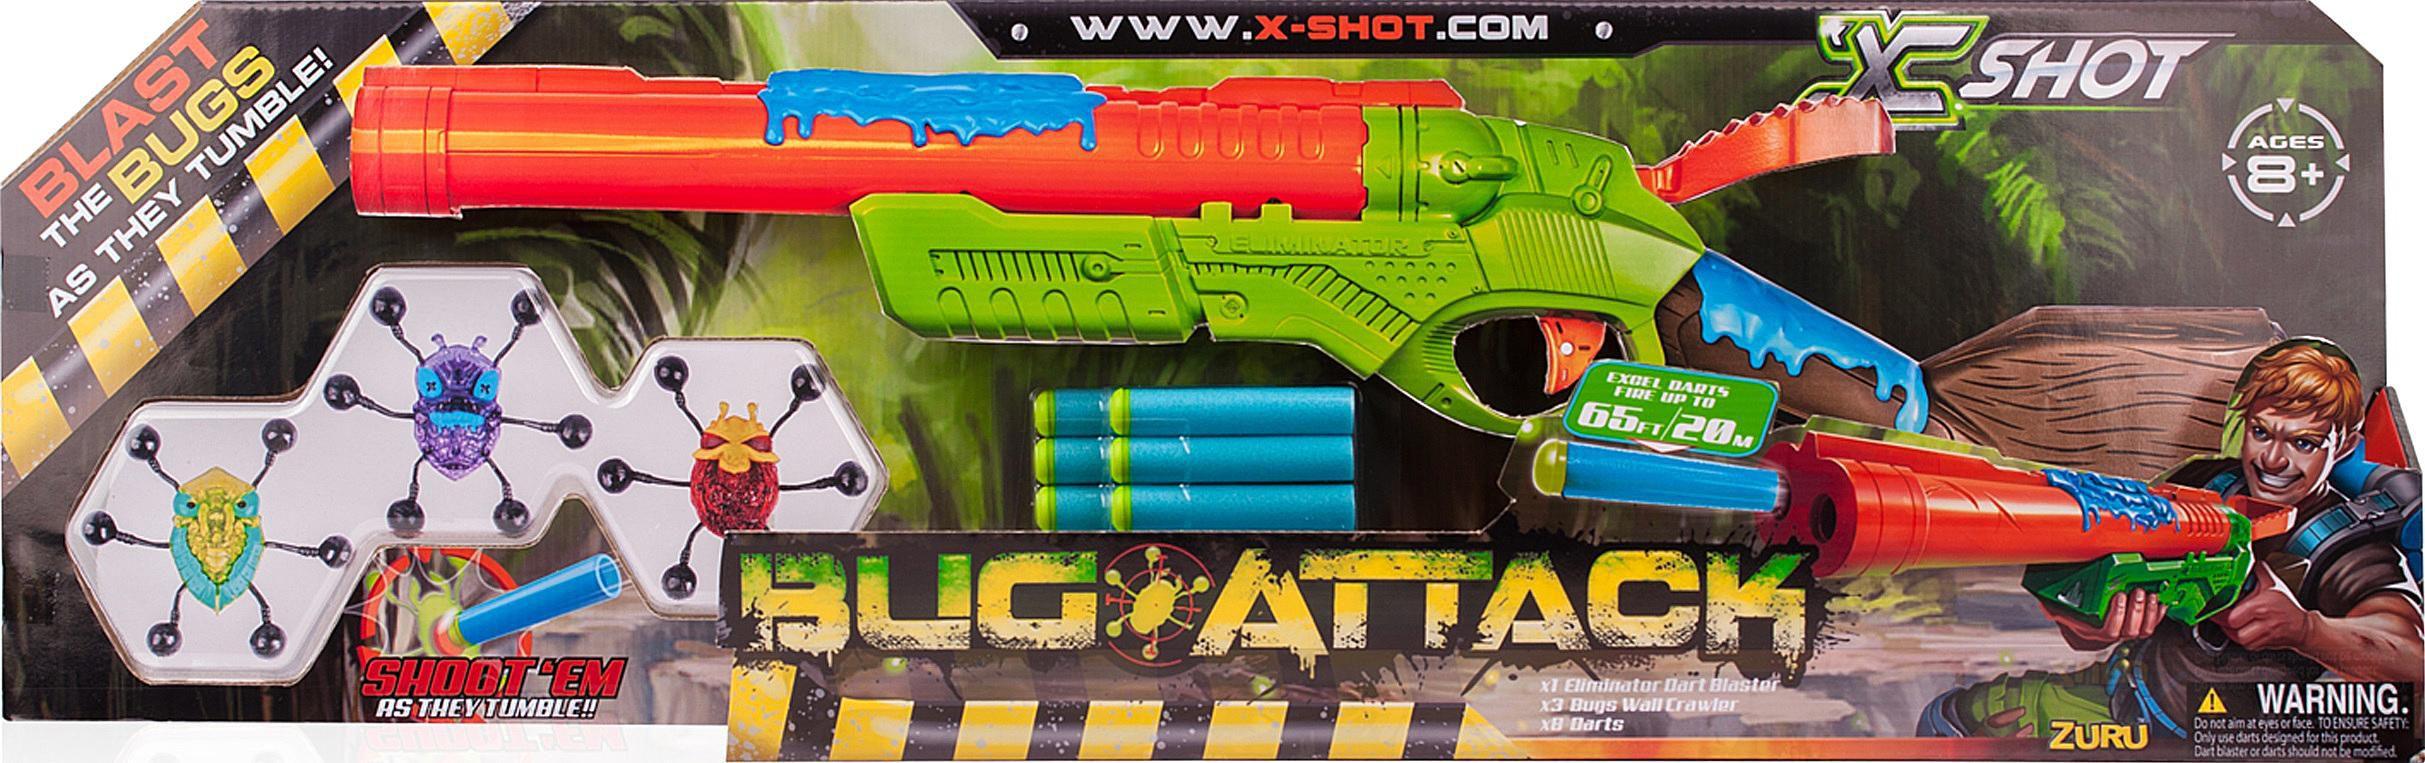 X Shot Bug Attack Eliminator Review